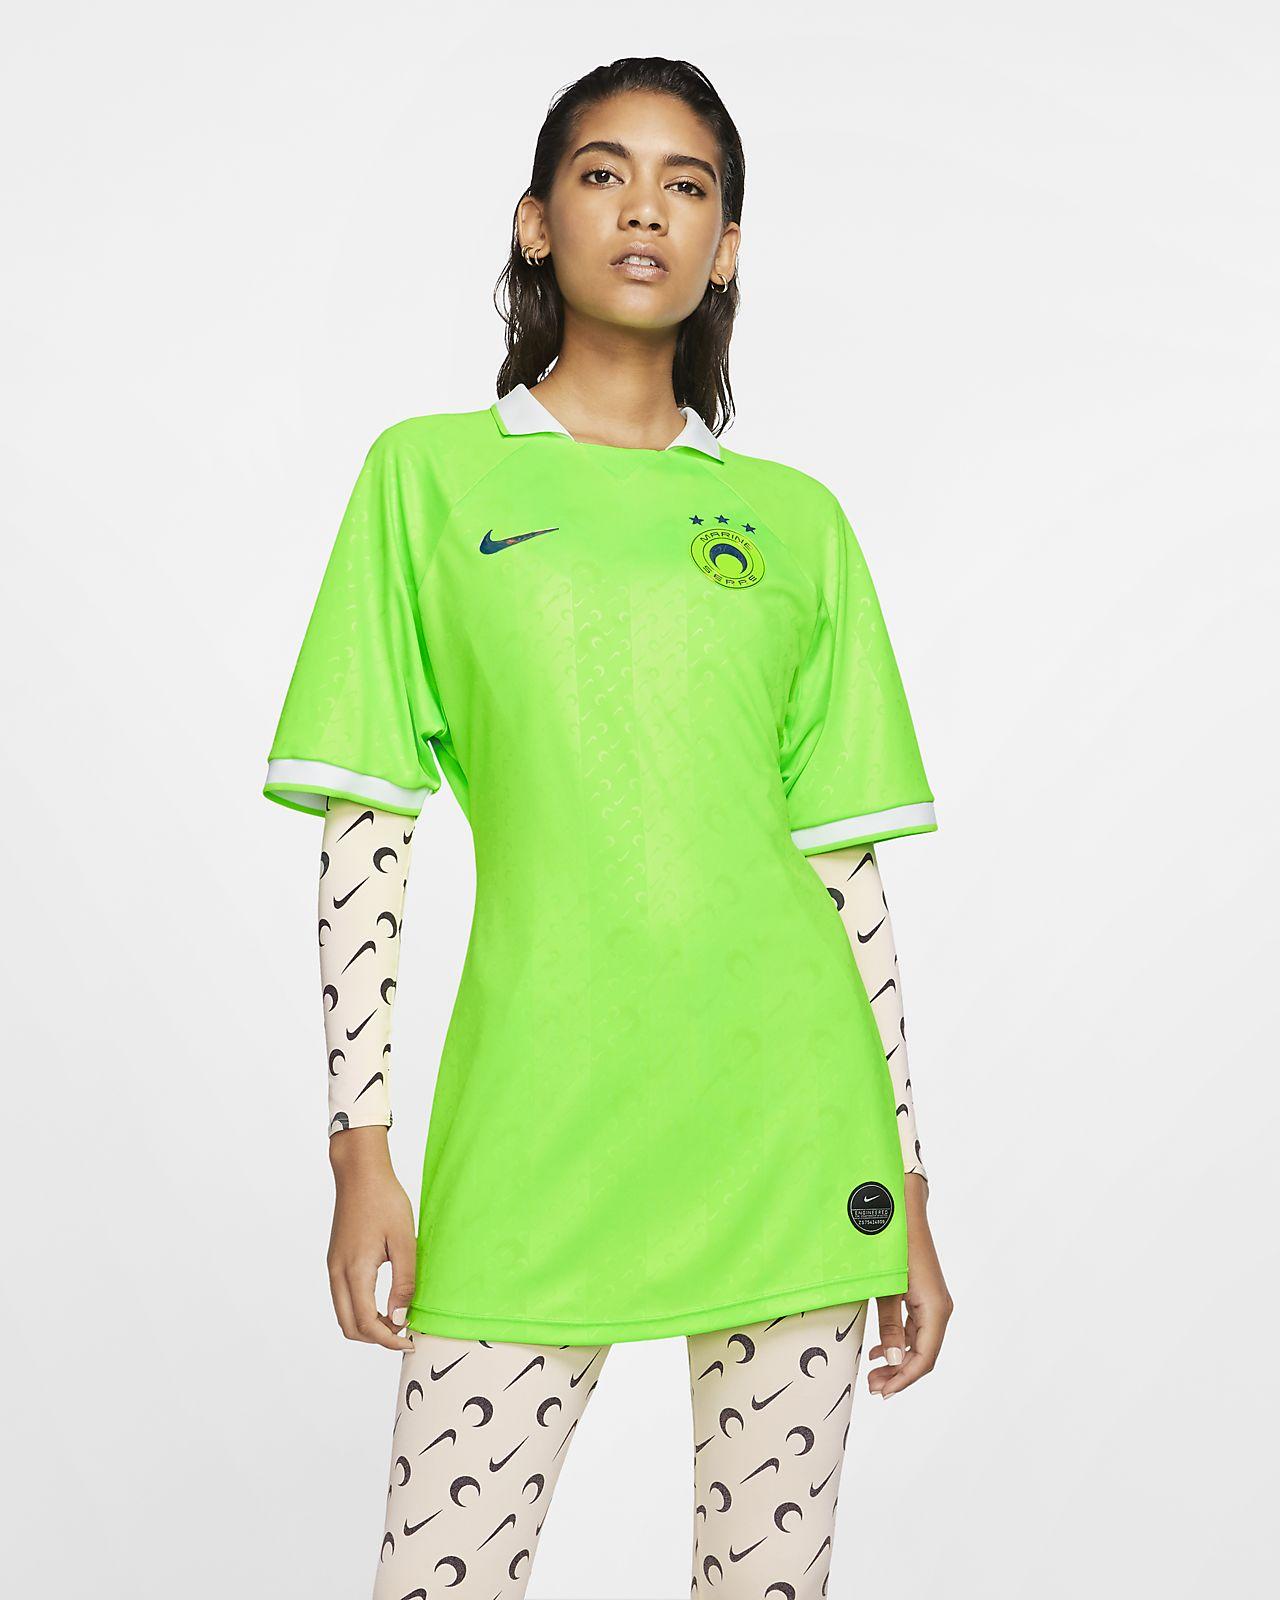 Nike x Marine Serre 2-in-1 damesshirt